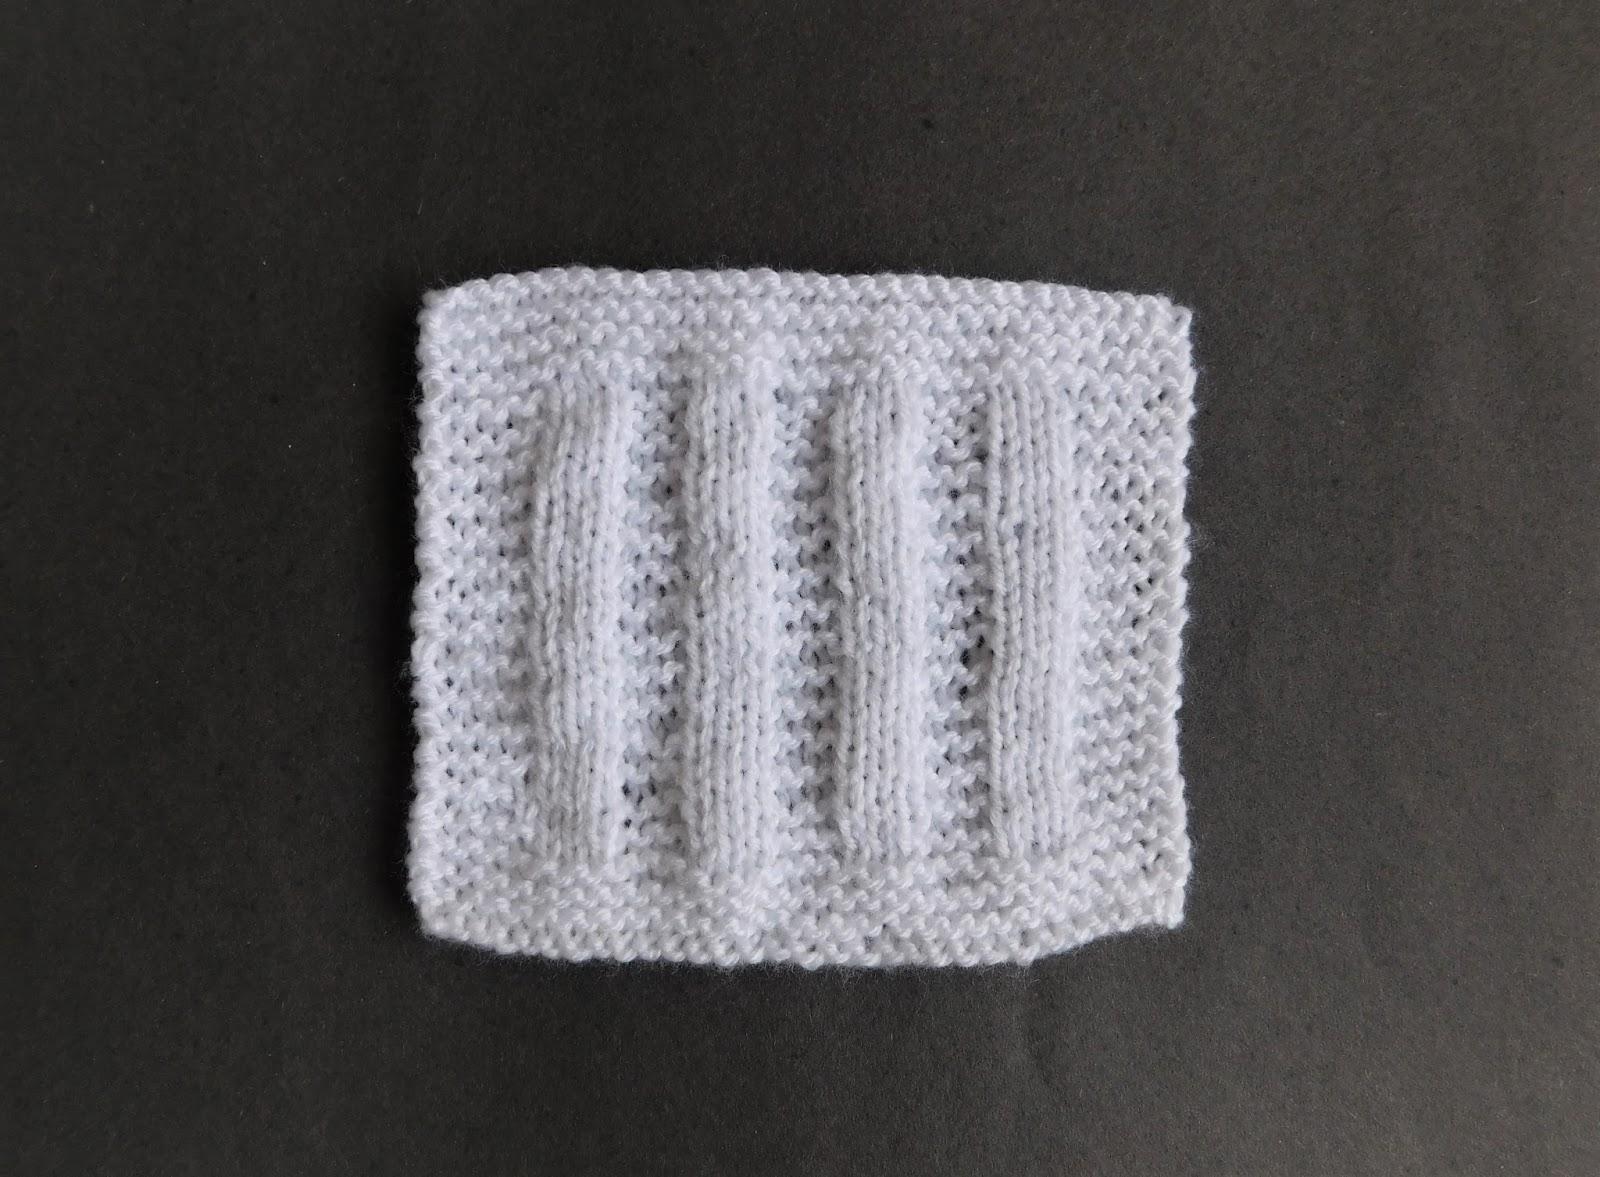 Knitting Pattern For Bonding Squares : mariannas lazy daisy days: Bonding Squares